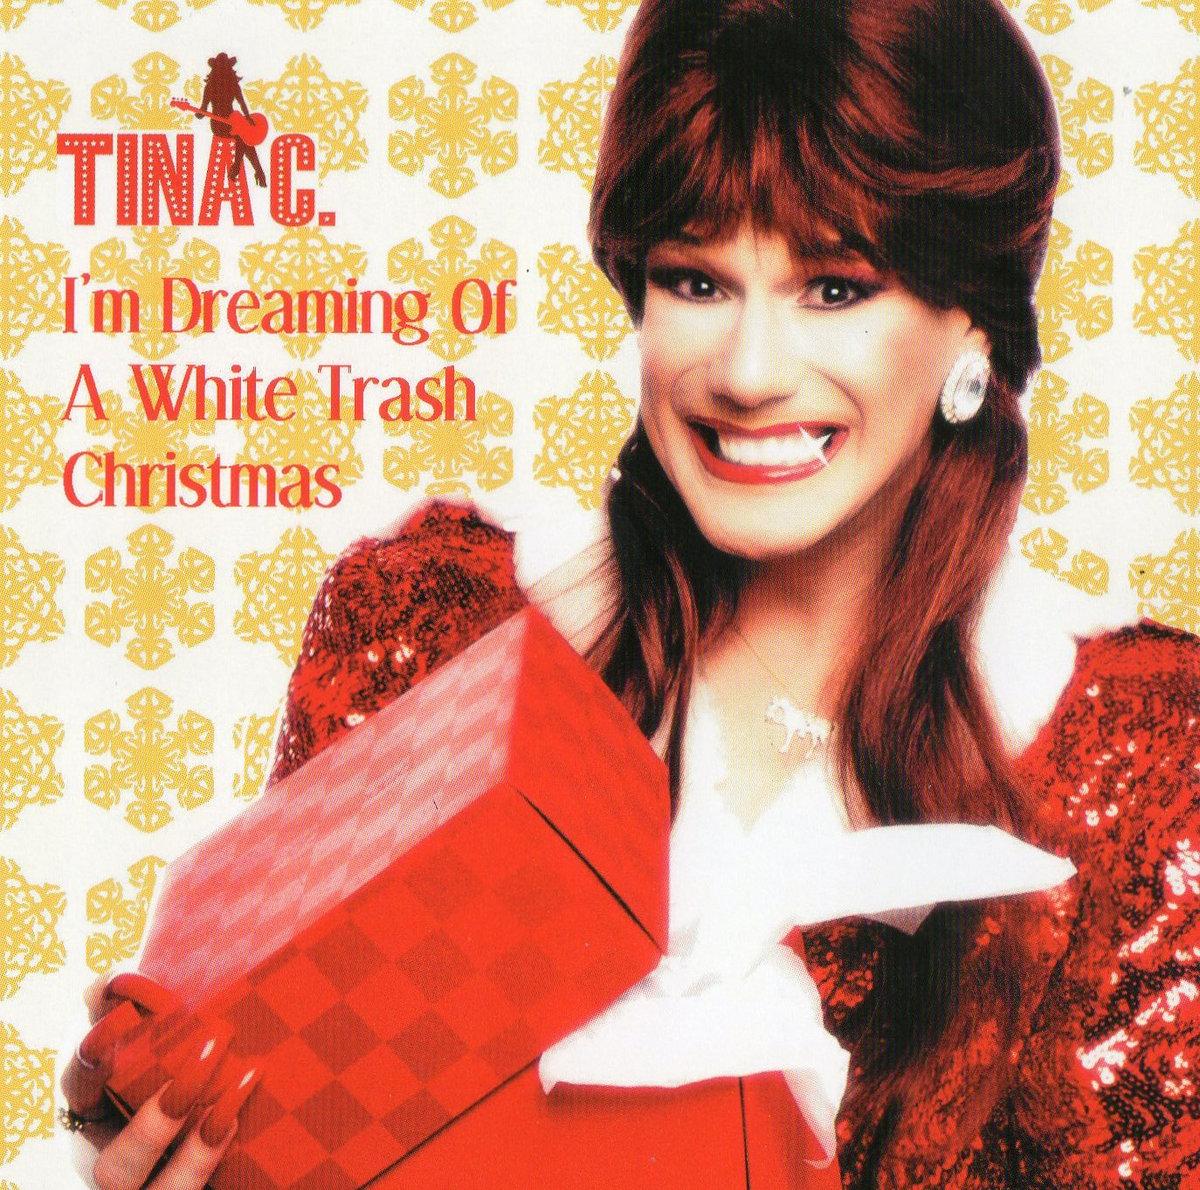 White Trash Christmas.I M Dreaming Of A White Trash Christmas Tina C